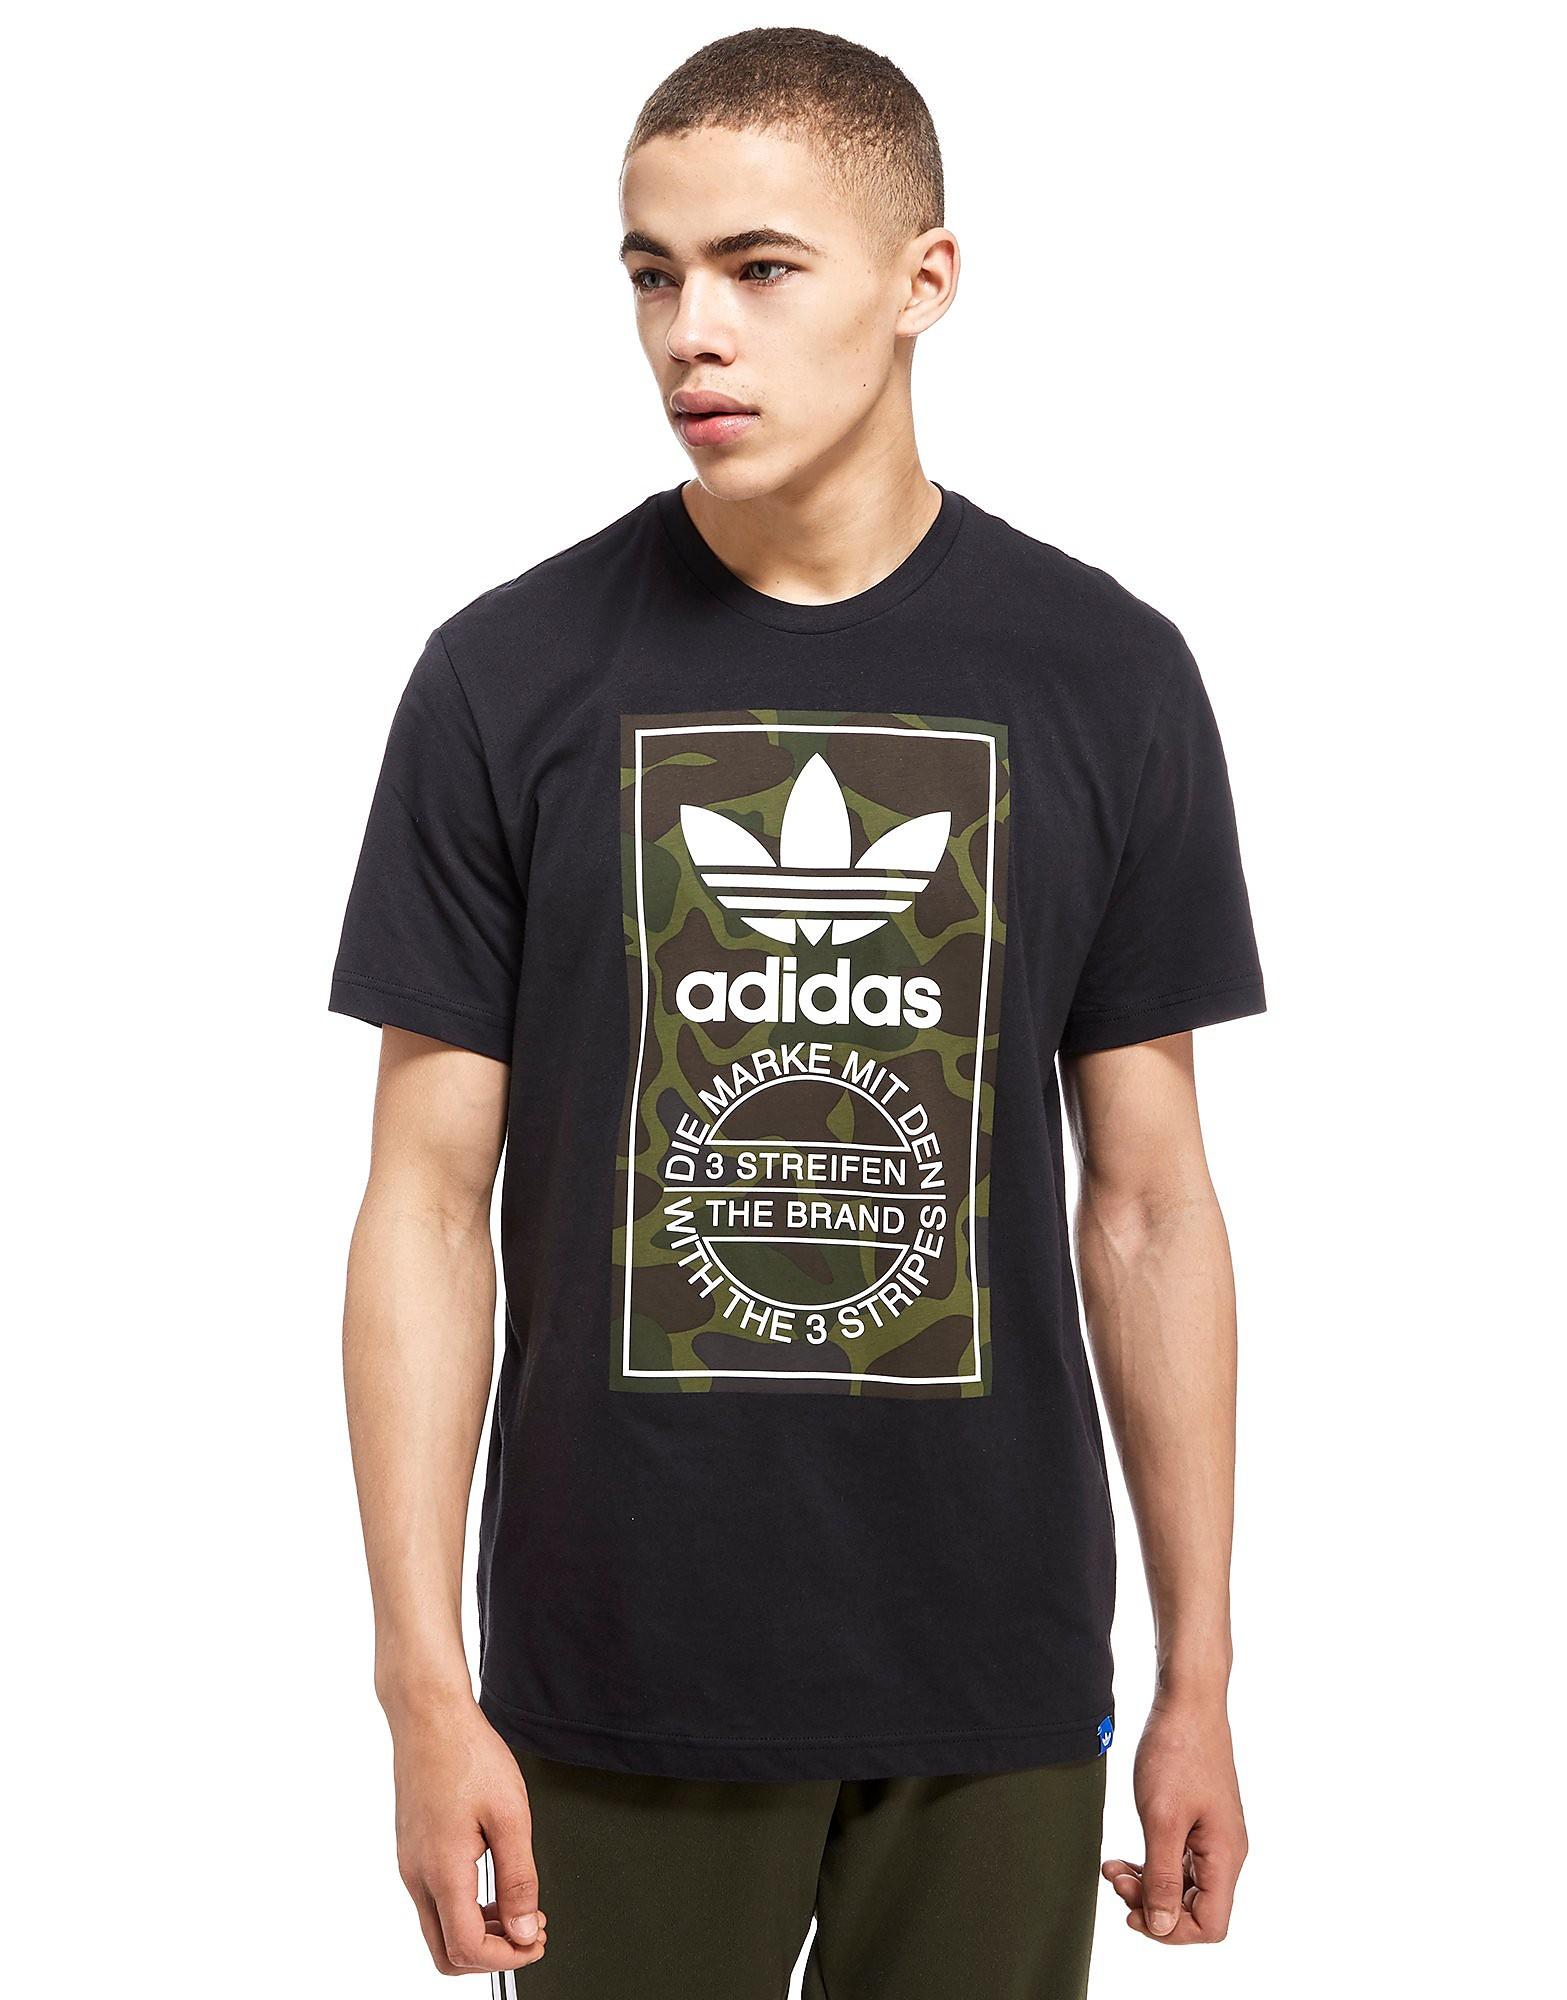 adidas Originals Label T-Shirt